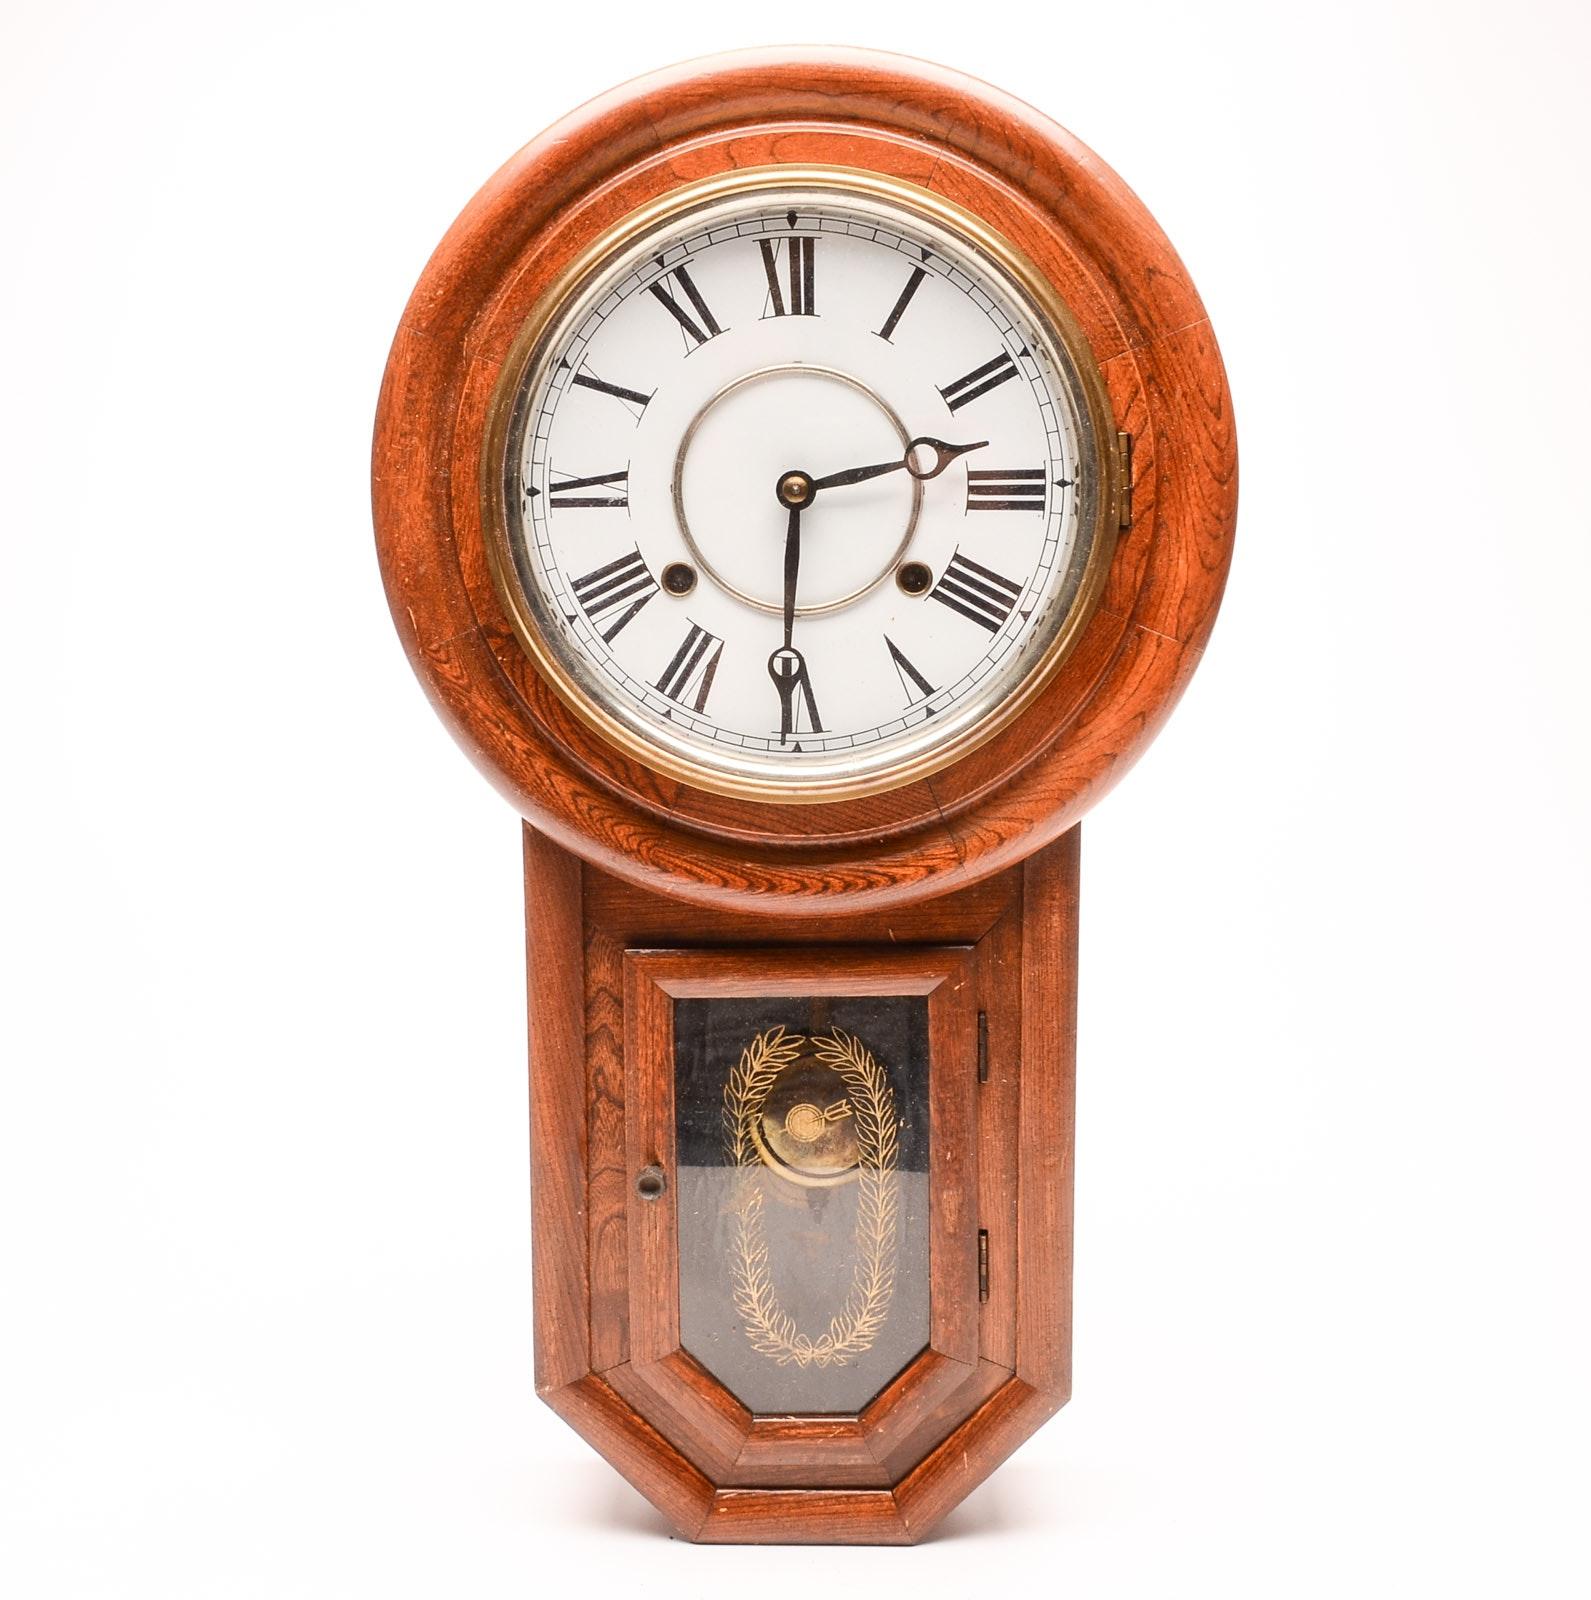 Antique Yamato Wall Clock